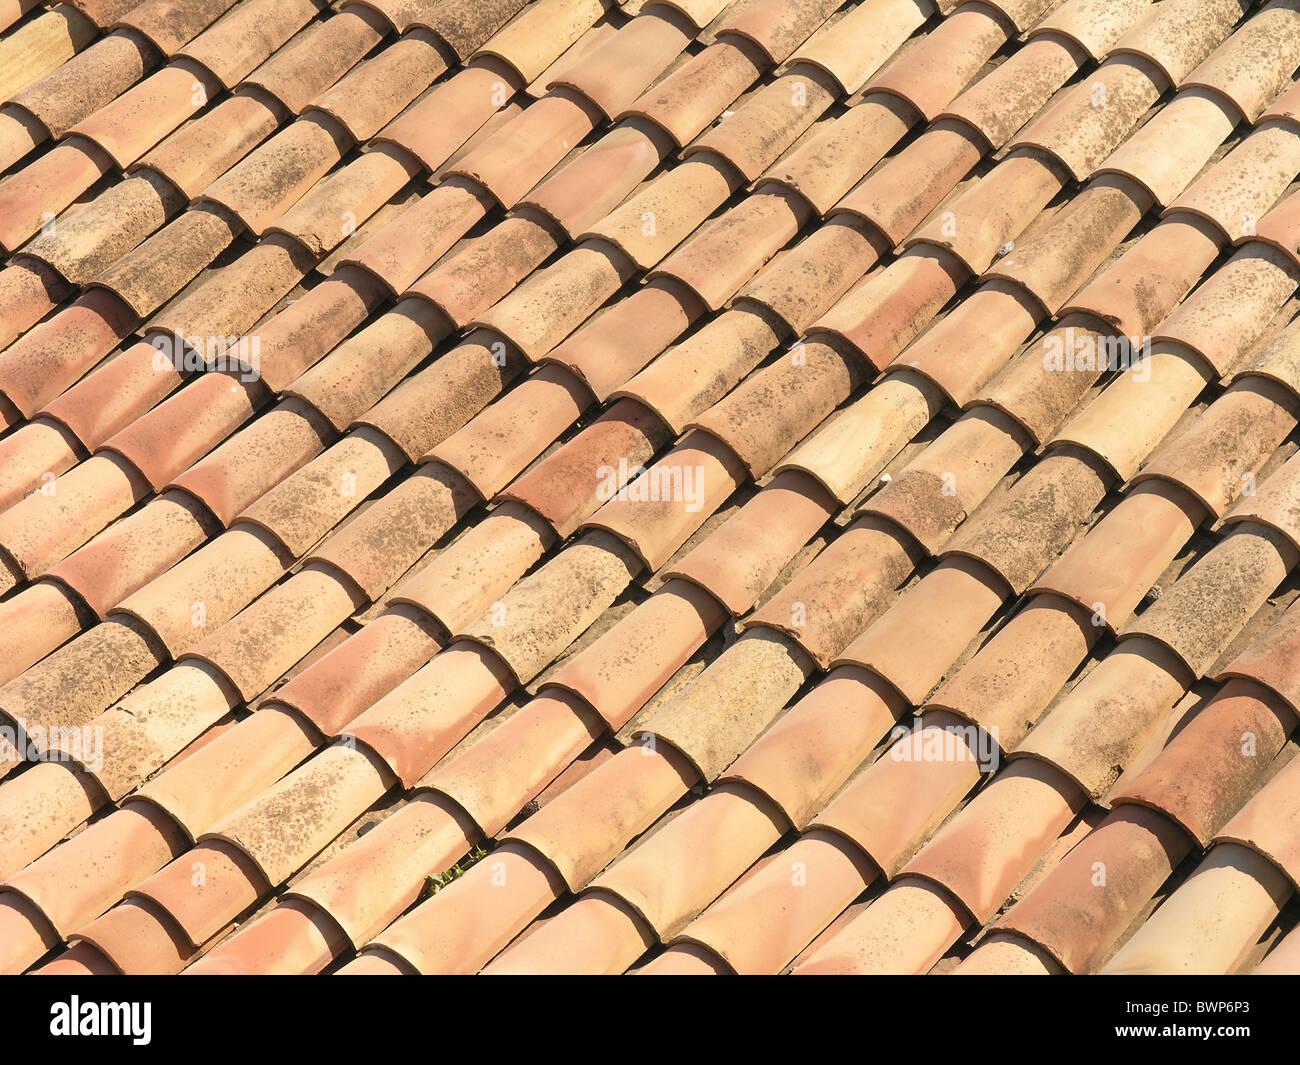 Roof tiles House top Terracotta Building Reddish - Stock Image